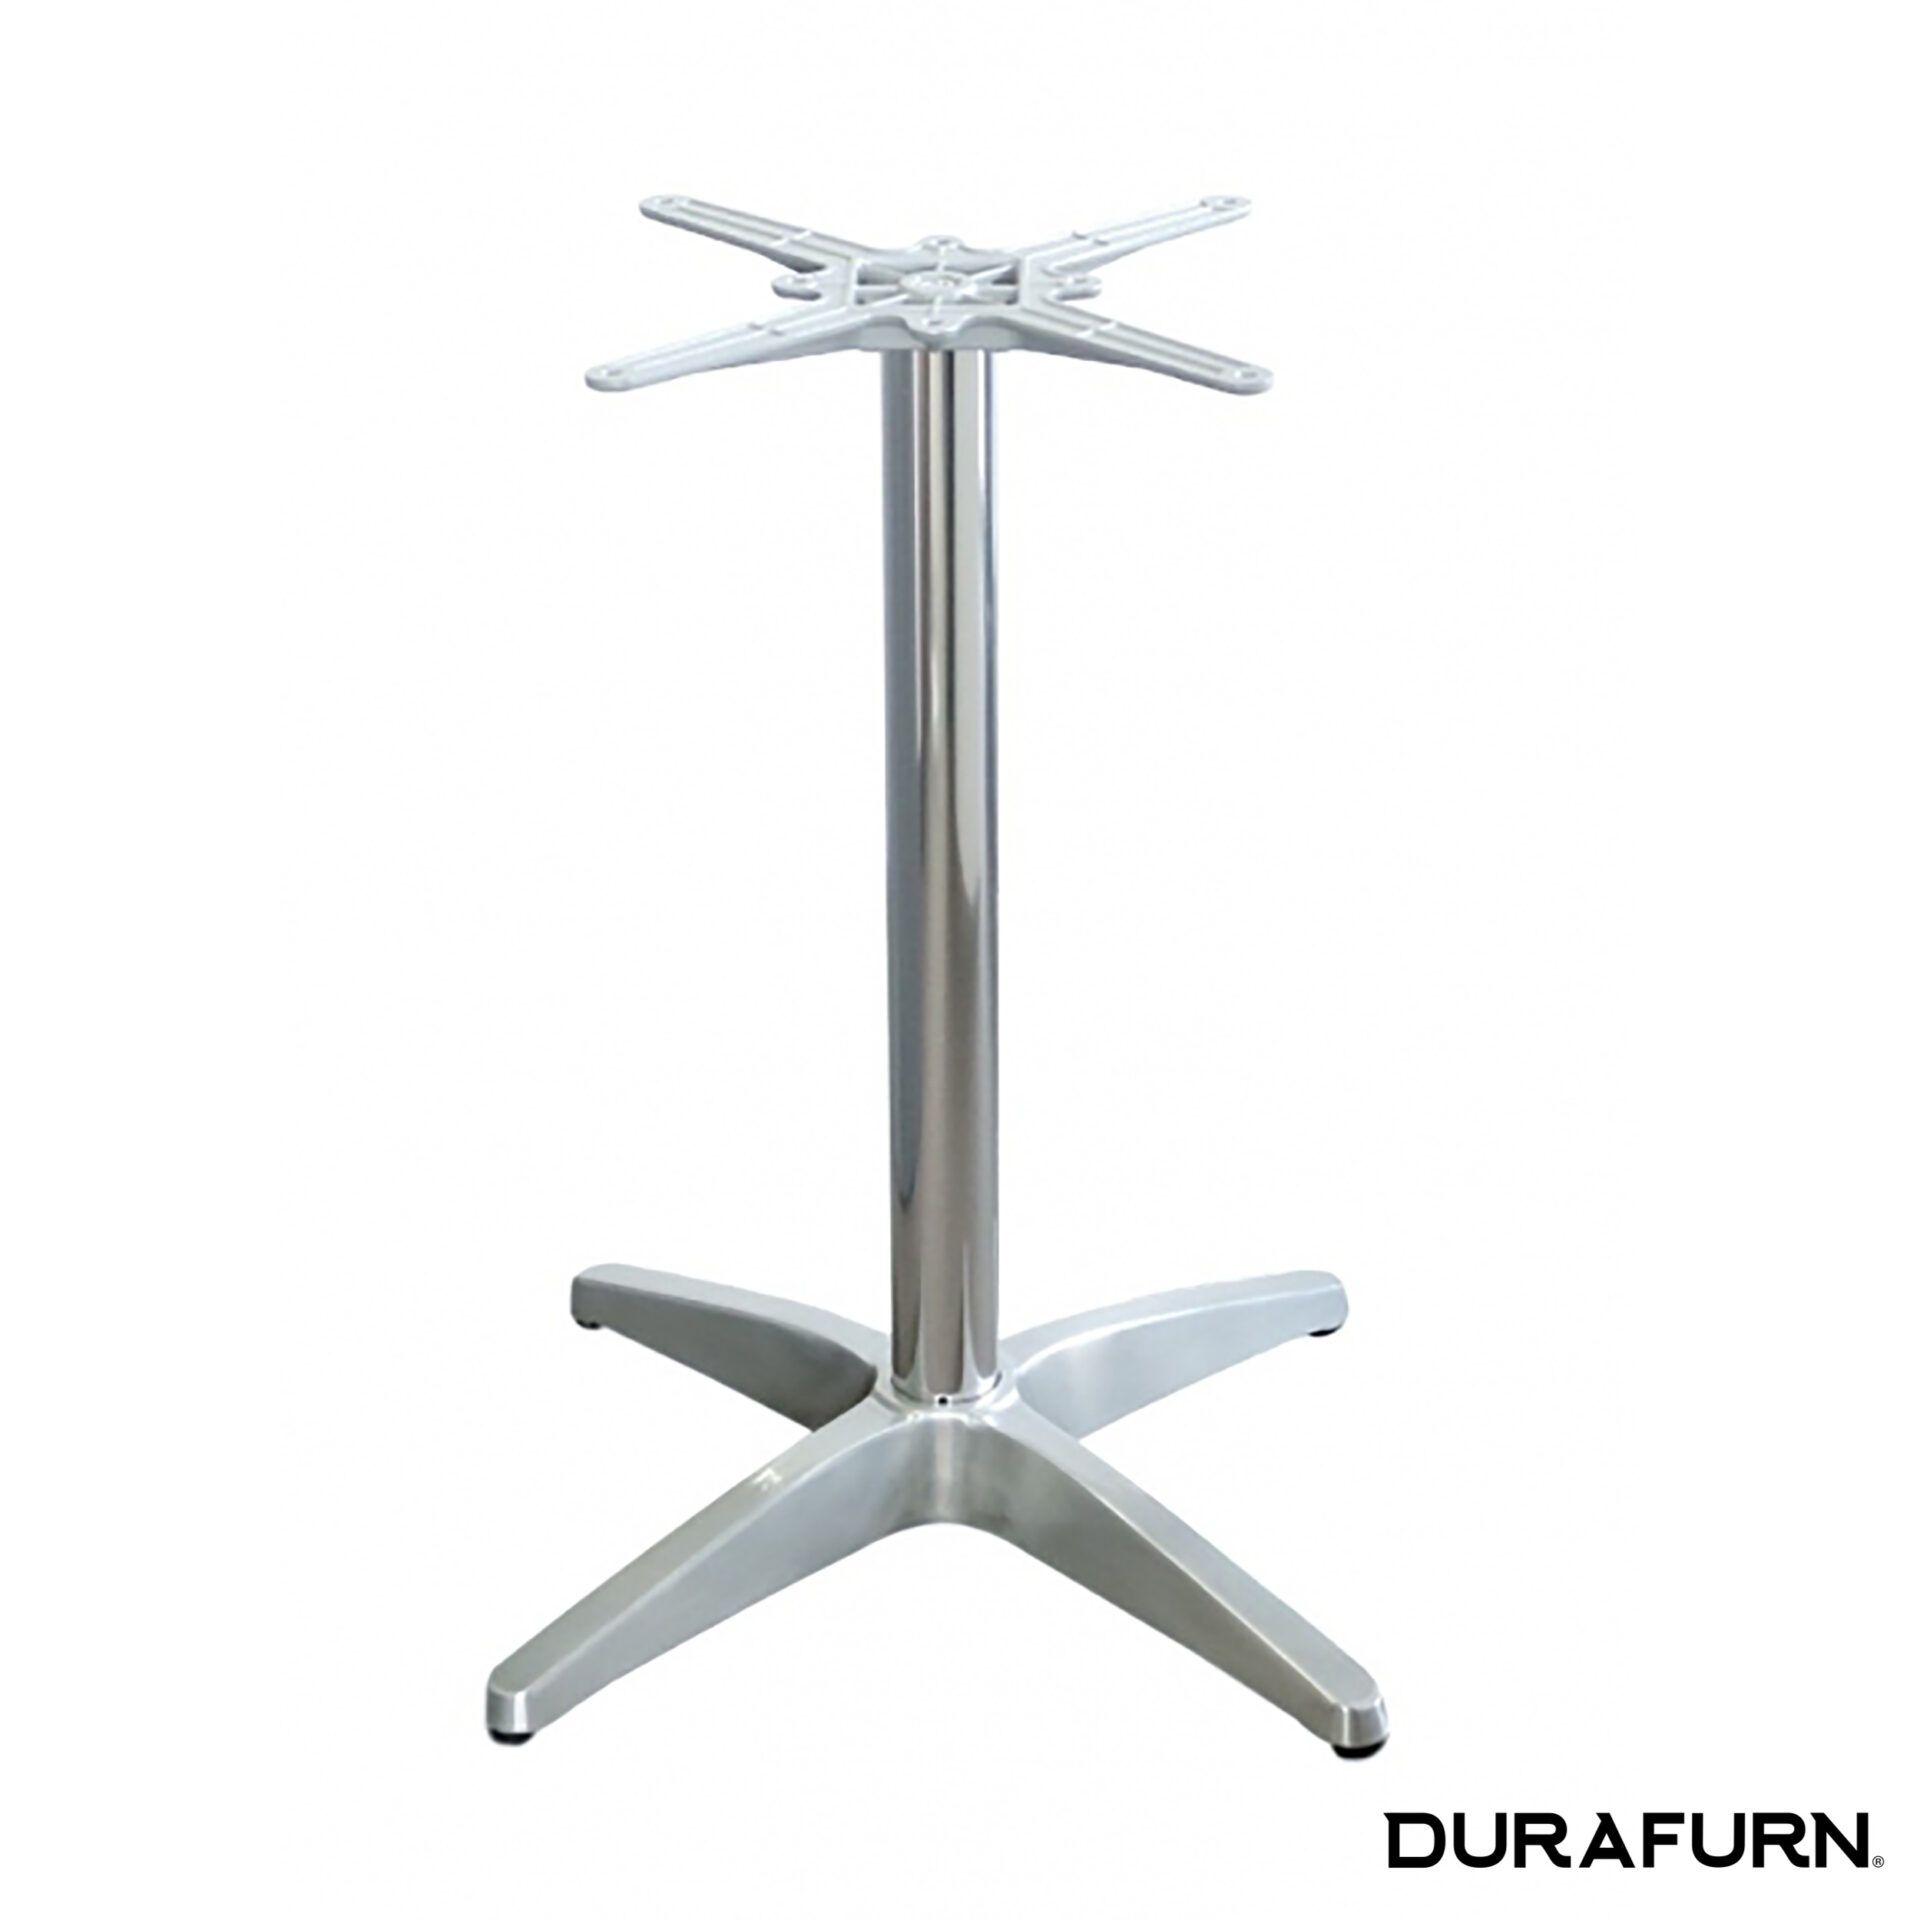 astoria aluminium table baseli11gd